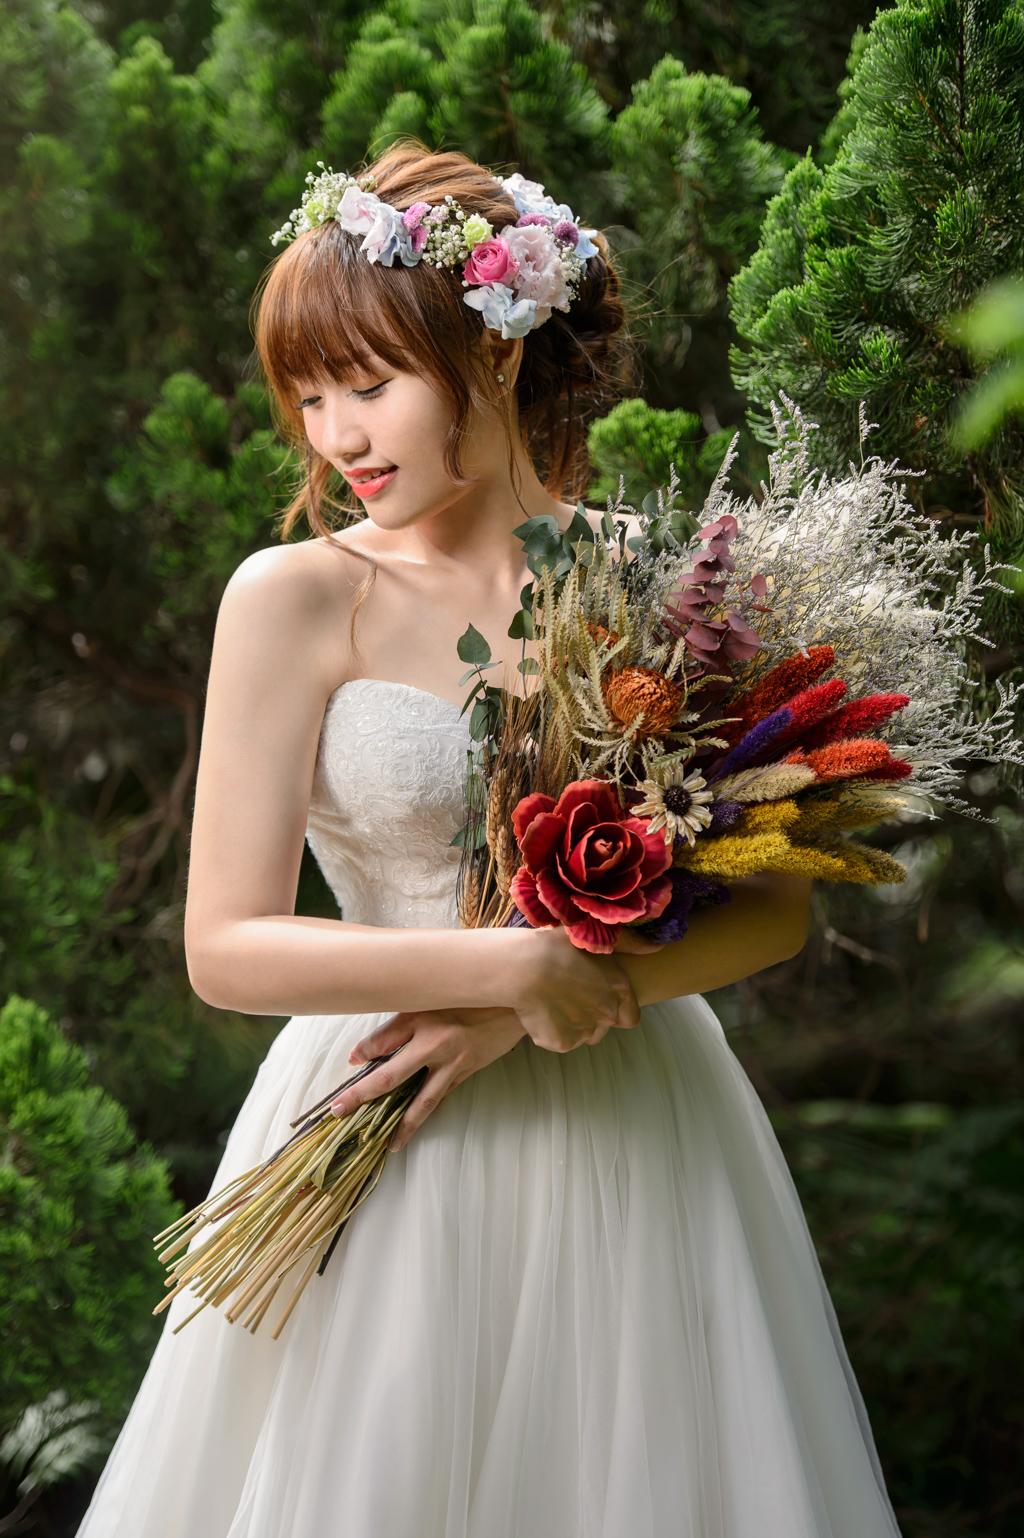 婚攝小勇, 小寶團隊, 自助婚紗, niniko, wedding day-001